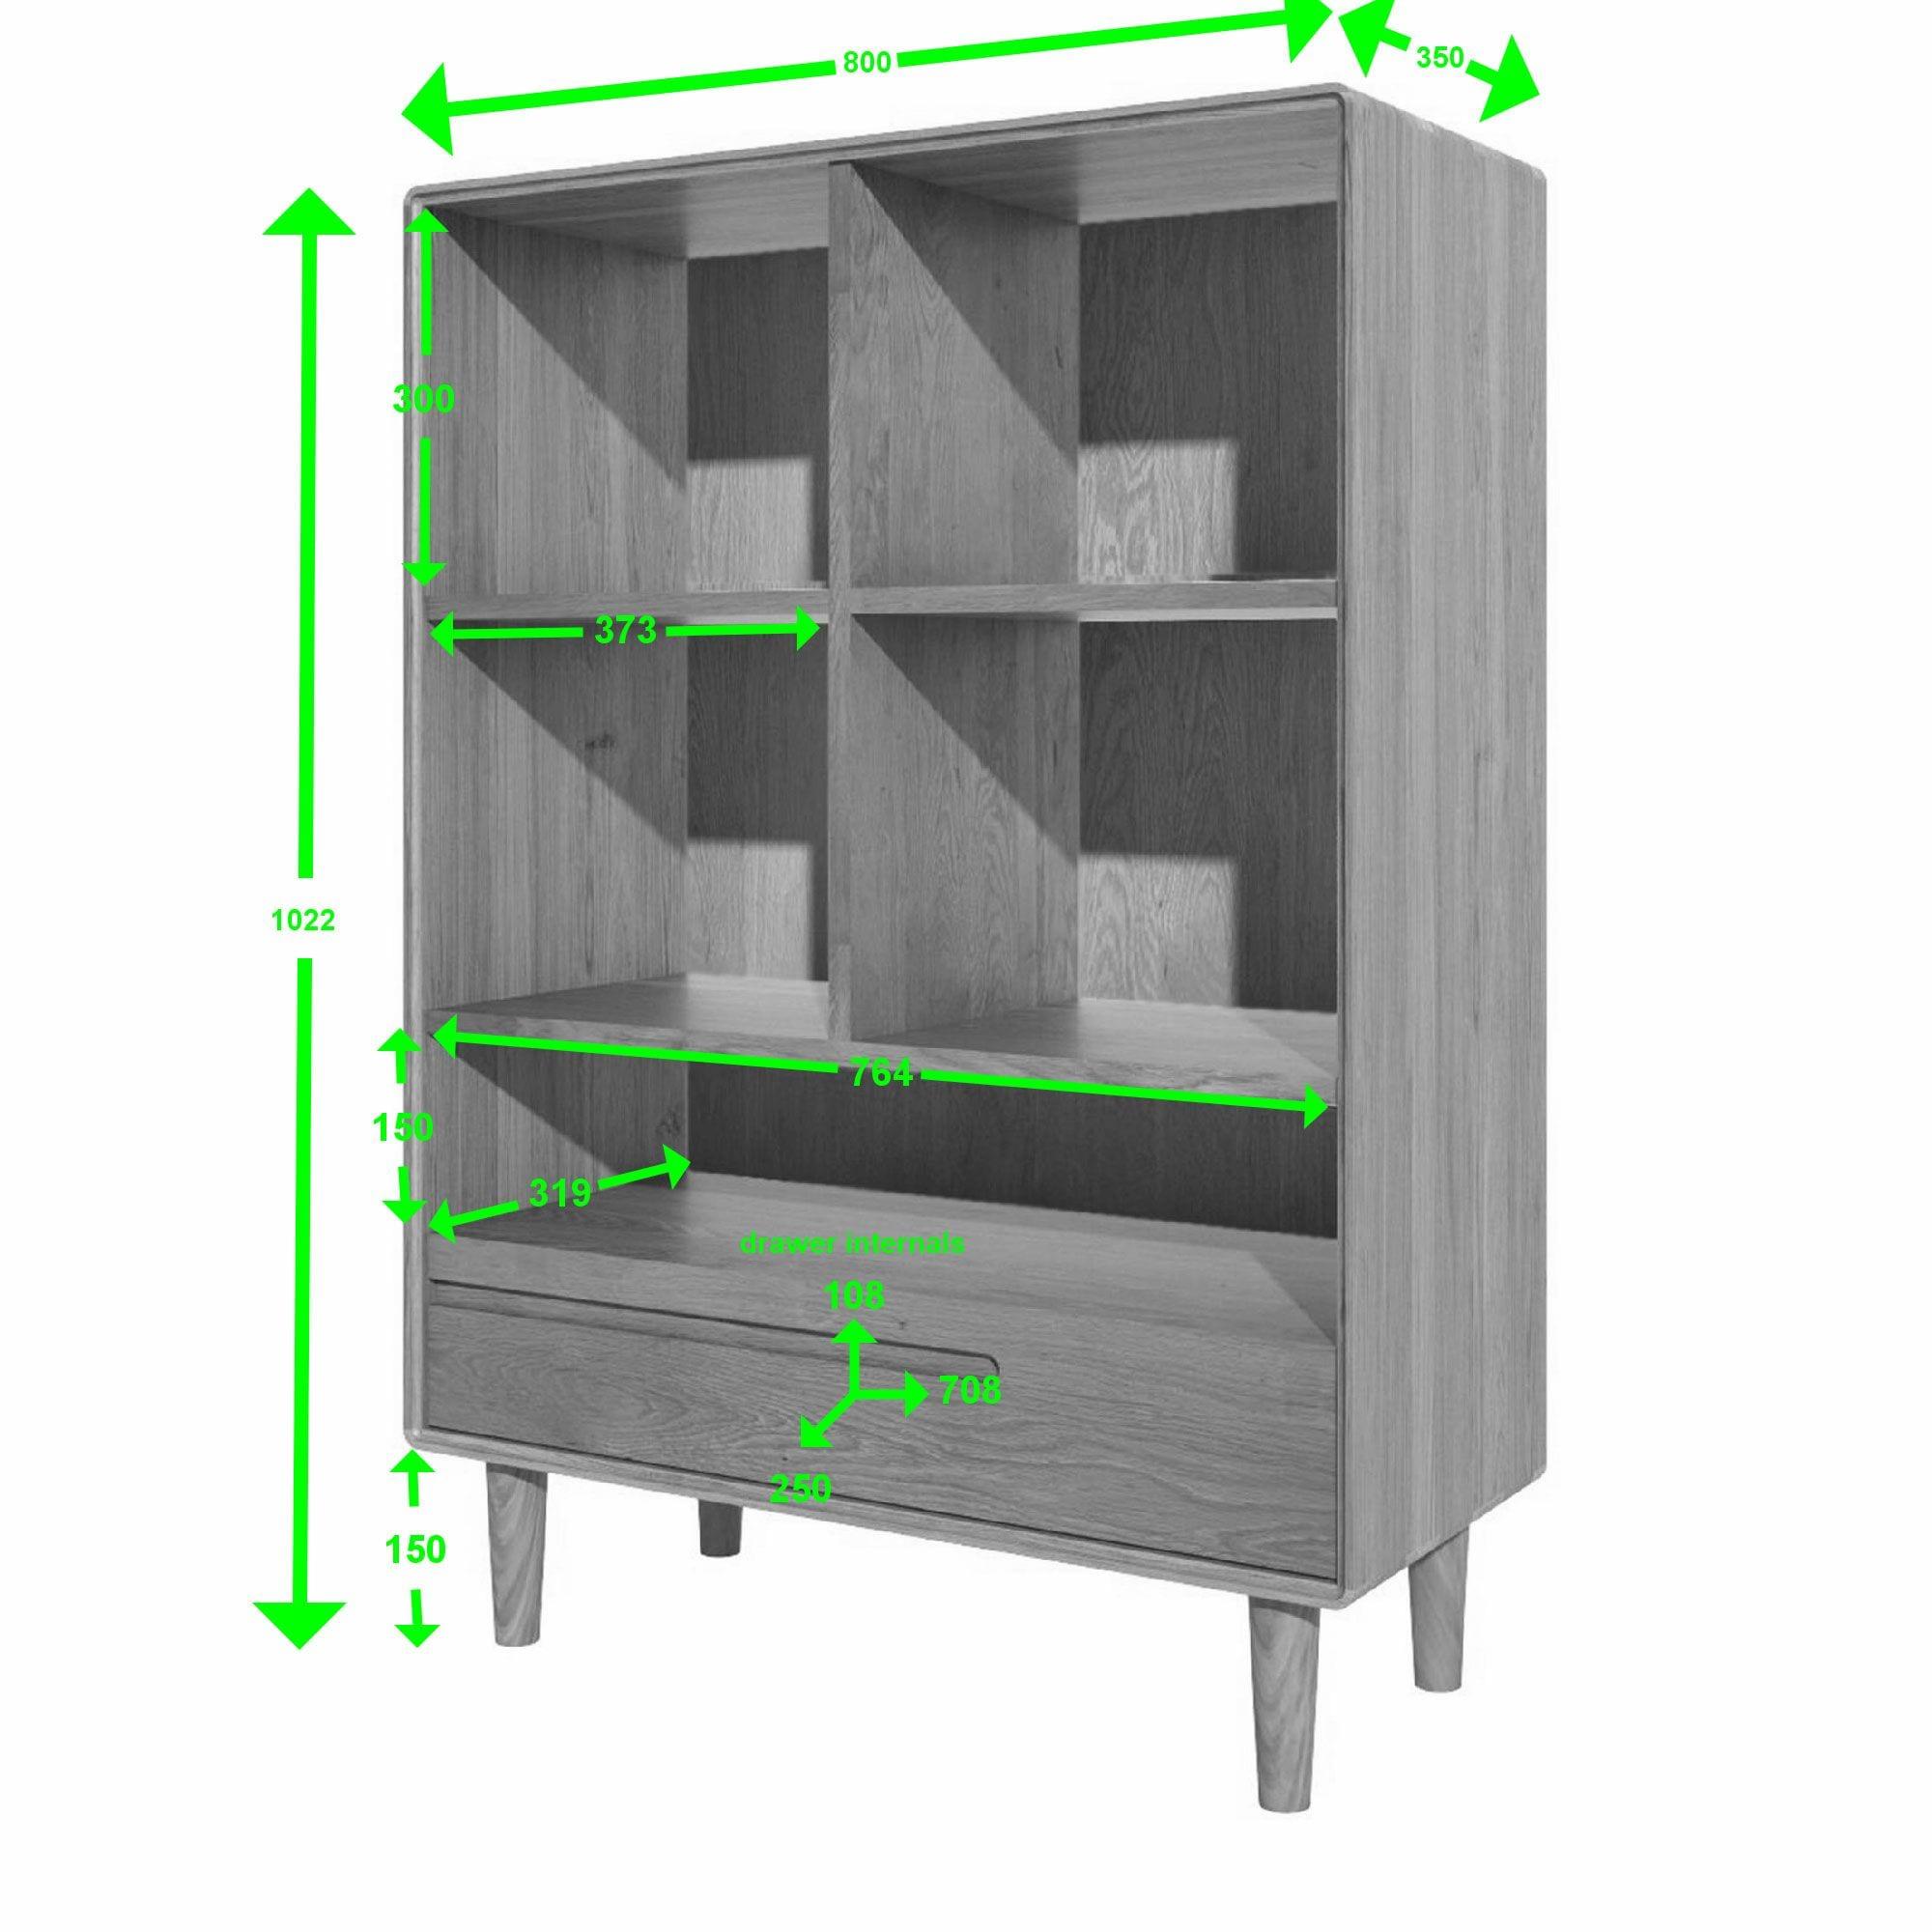 small scandic oak bookcase measurements